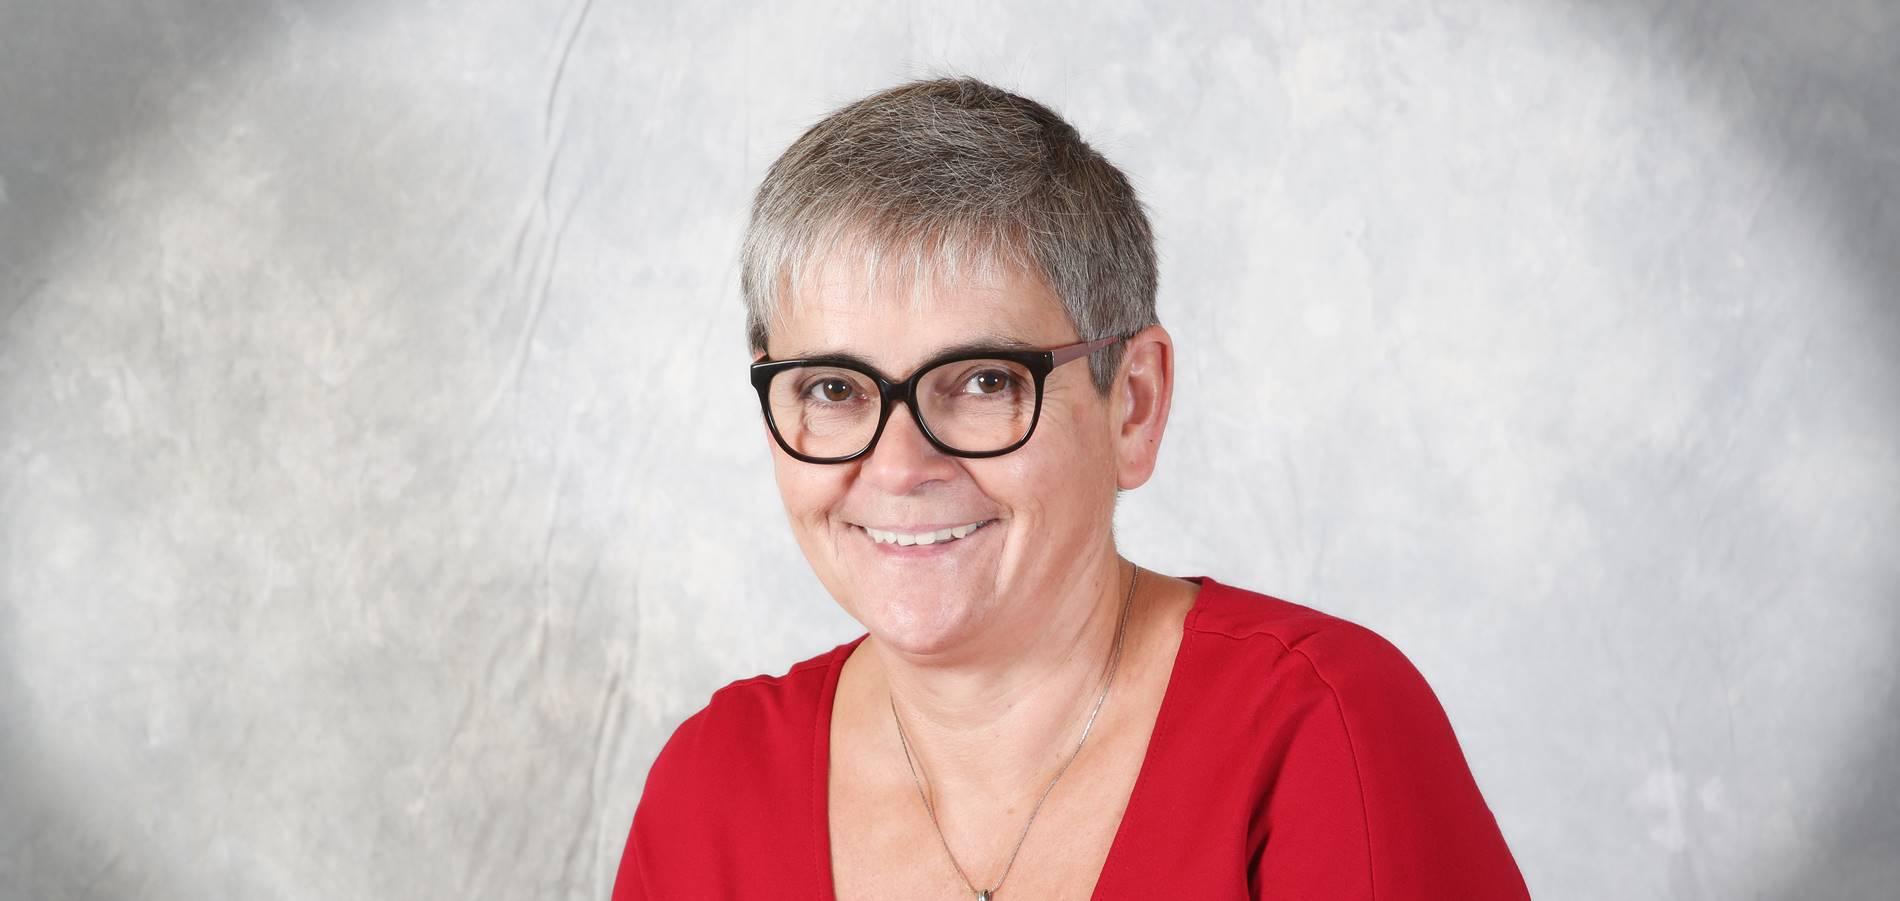 Sonja Wurth ist schwarzwaldlieb